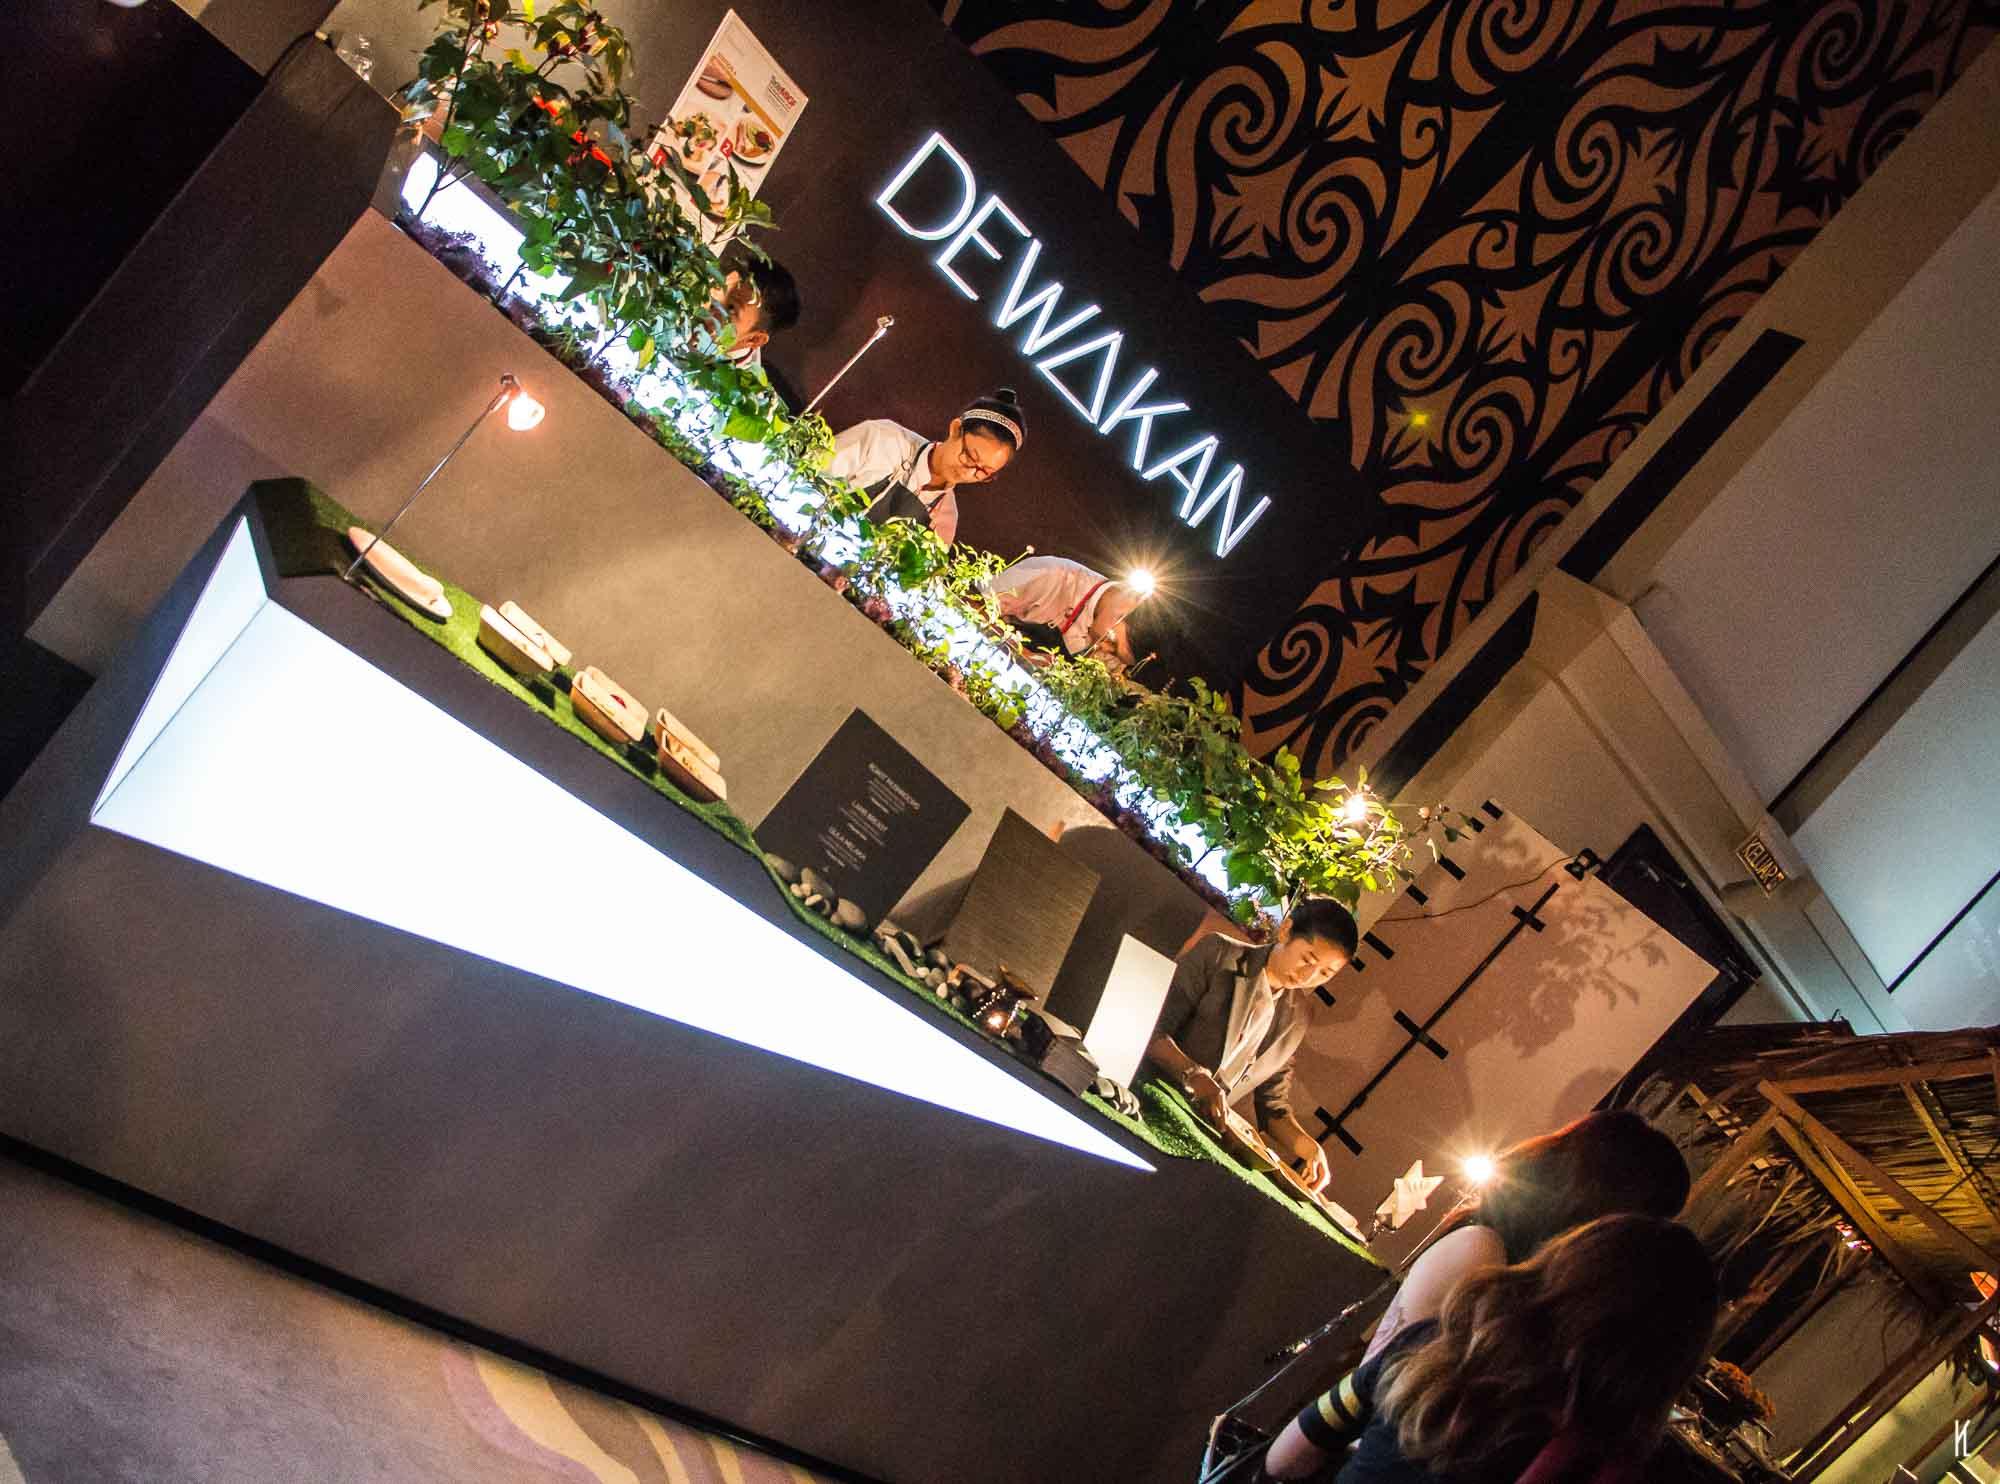 Booth Design for Dewakan at Taste MIGF (Malaysian International Gourmet Festival)